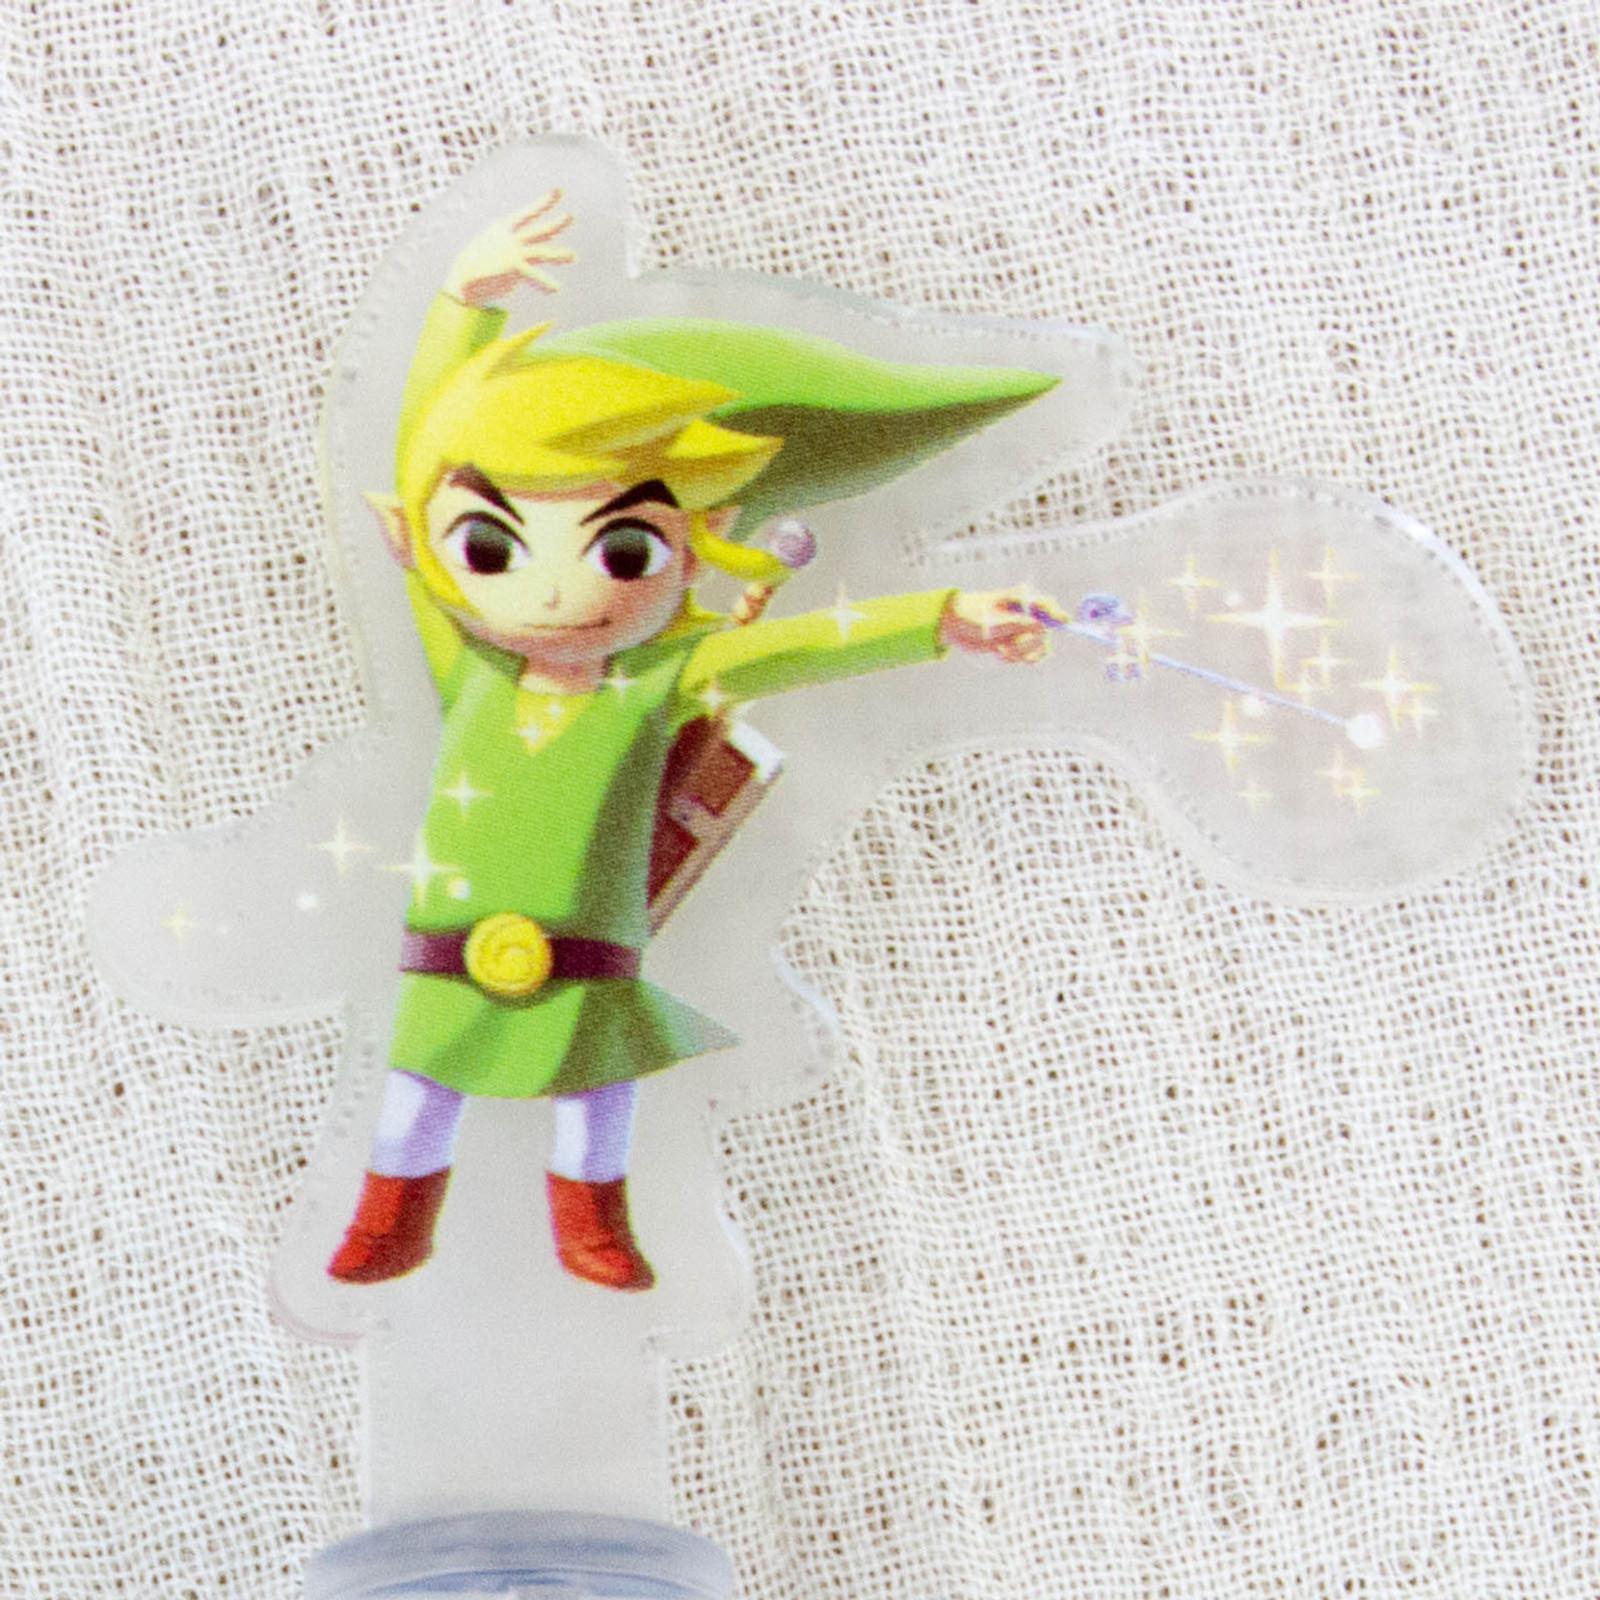 Legend of Zelda Historical 3DS Chara Touch Pen JAPAN FAMICOM NES NINTENDO 4